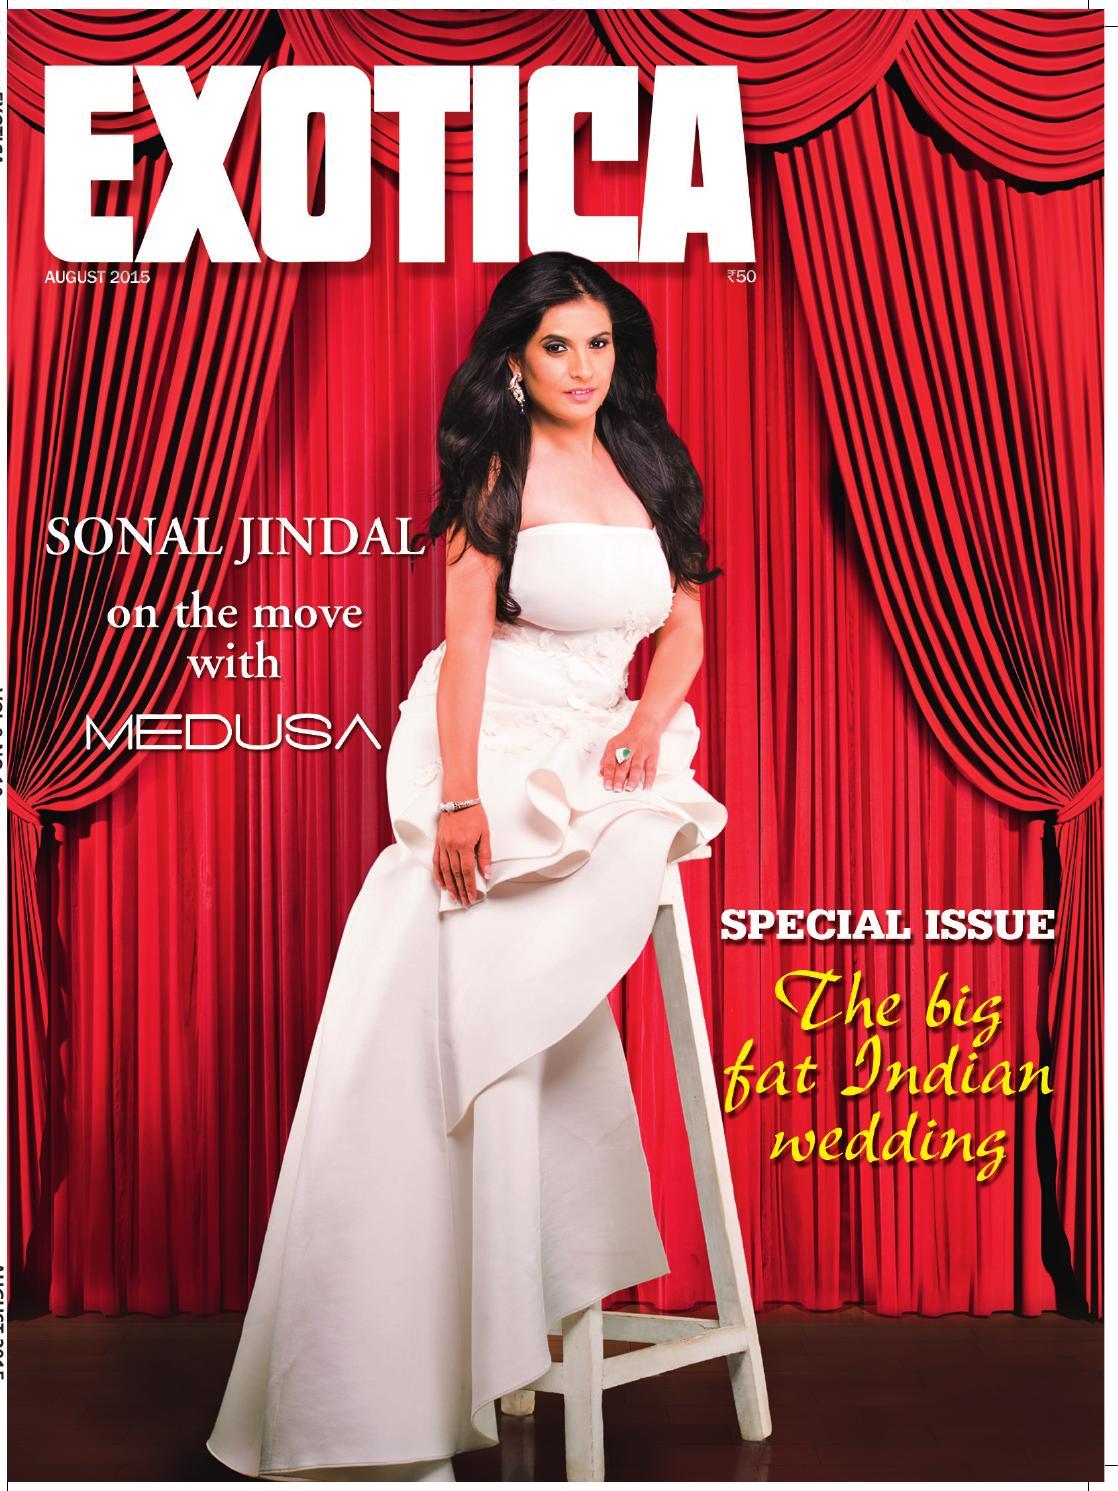 Exotica aug 2015 by Exotica Magazine - Issuu